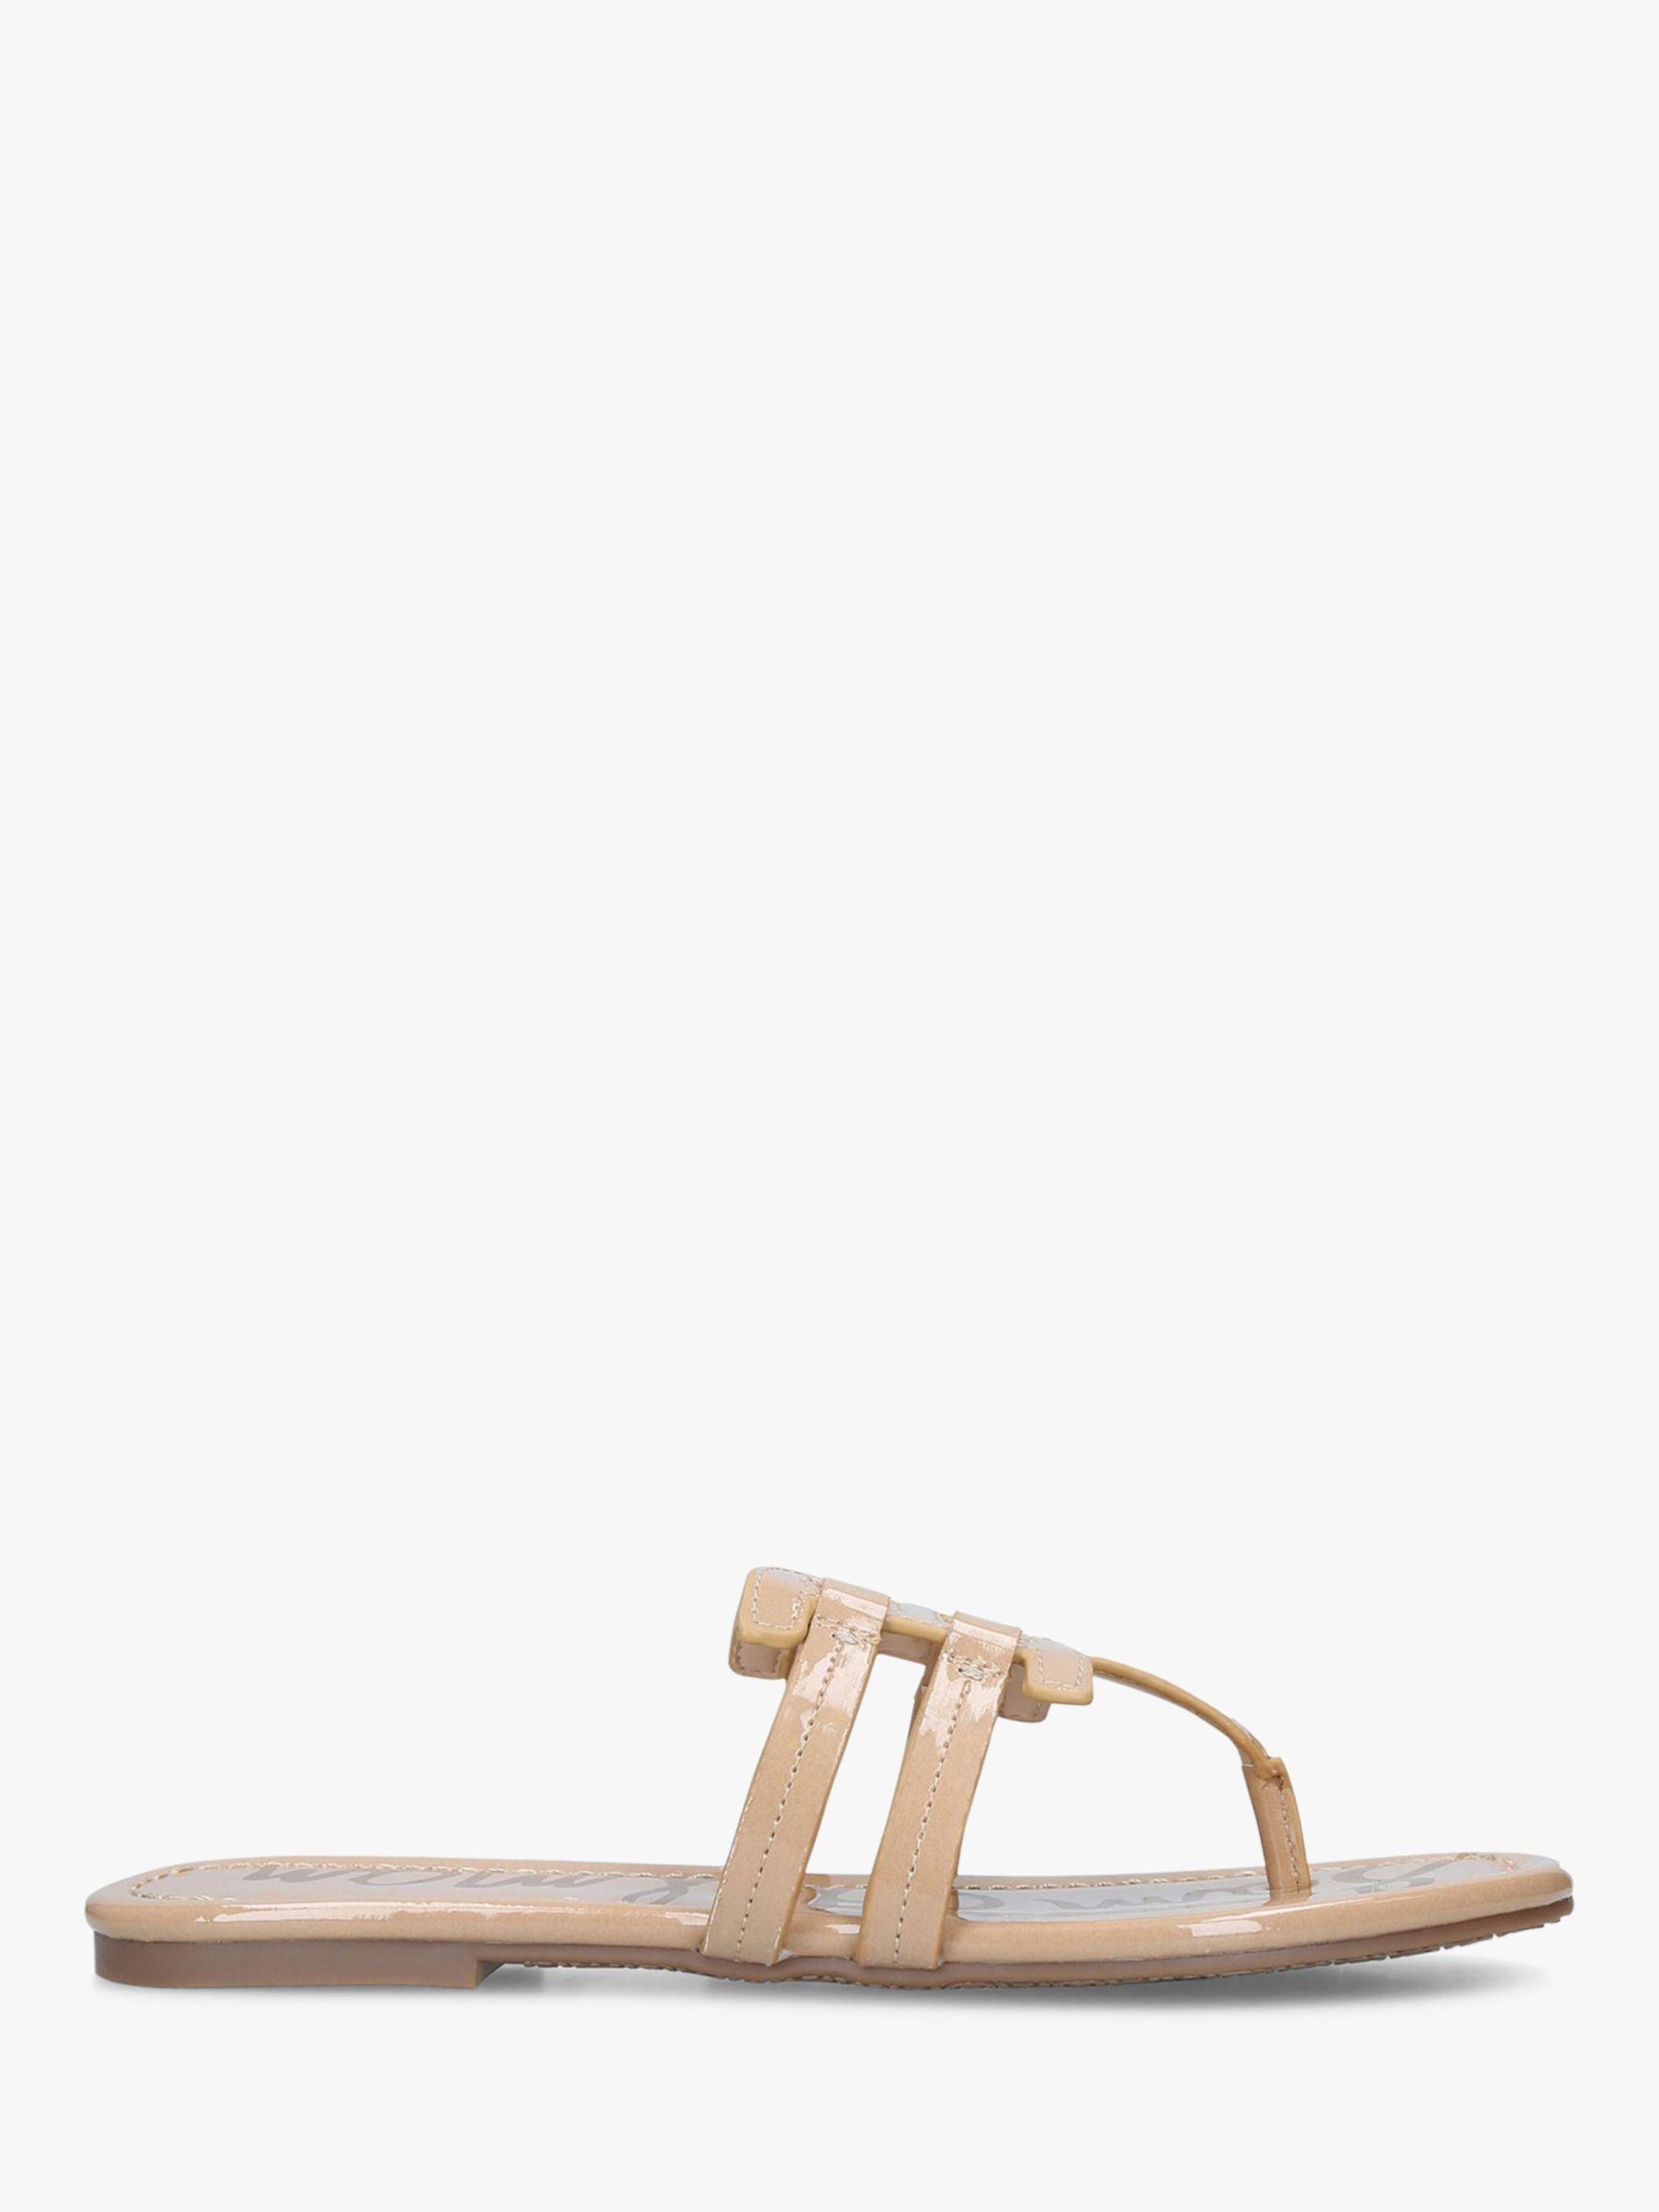 ba688a833 Sam Edelman Flat Slip-on Sandals in Natural - Lyst